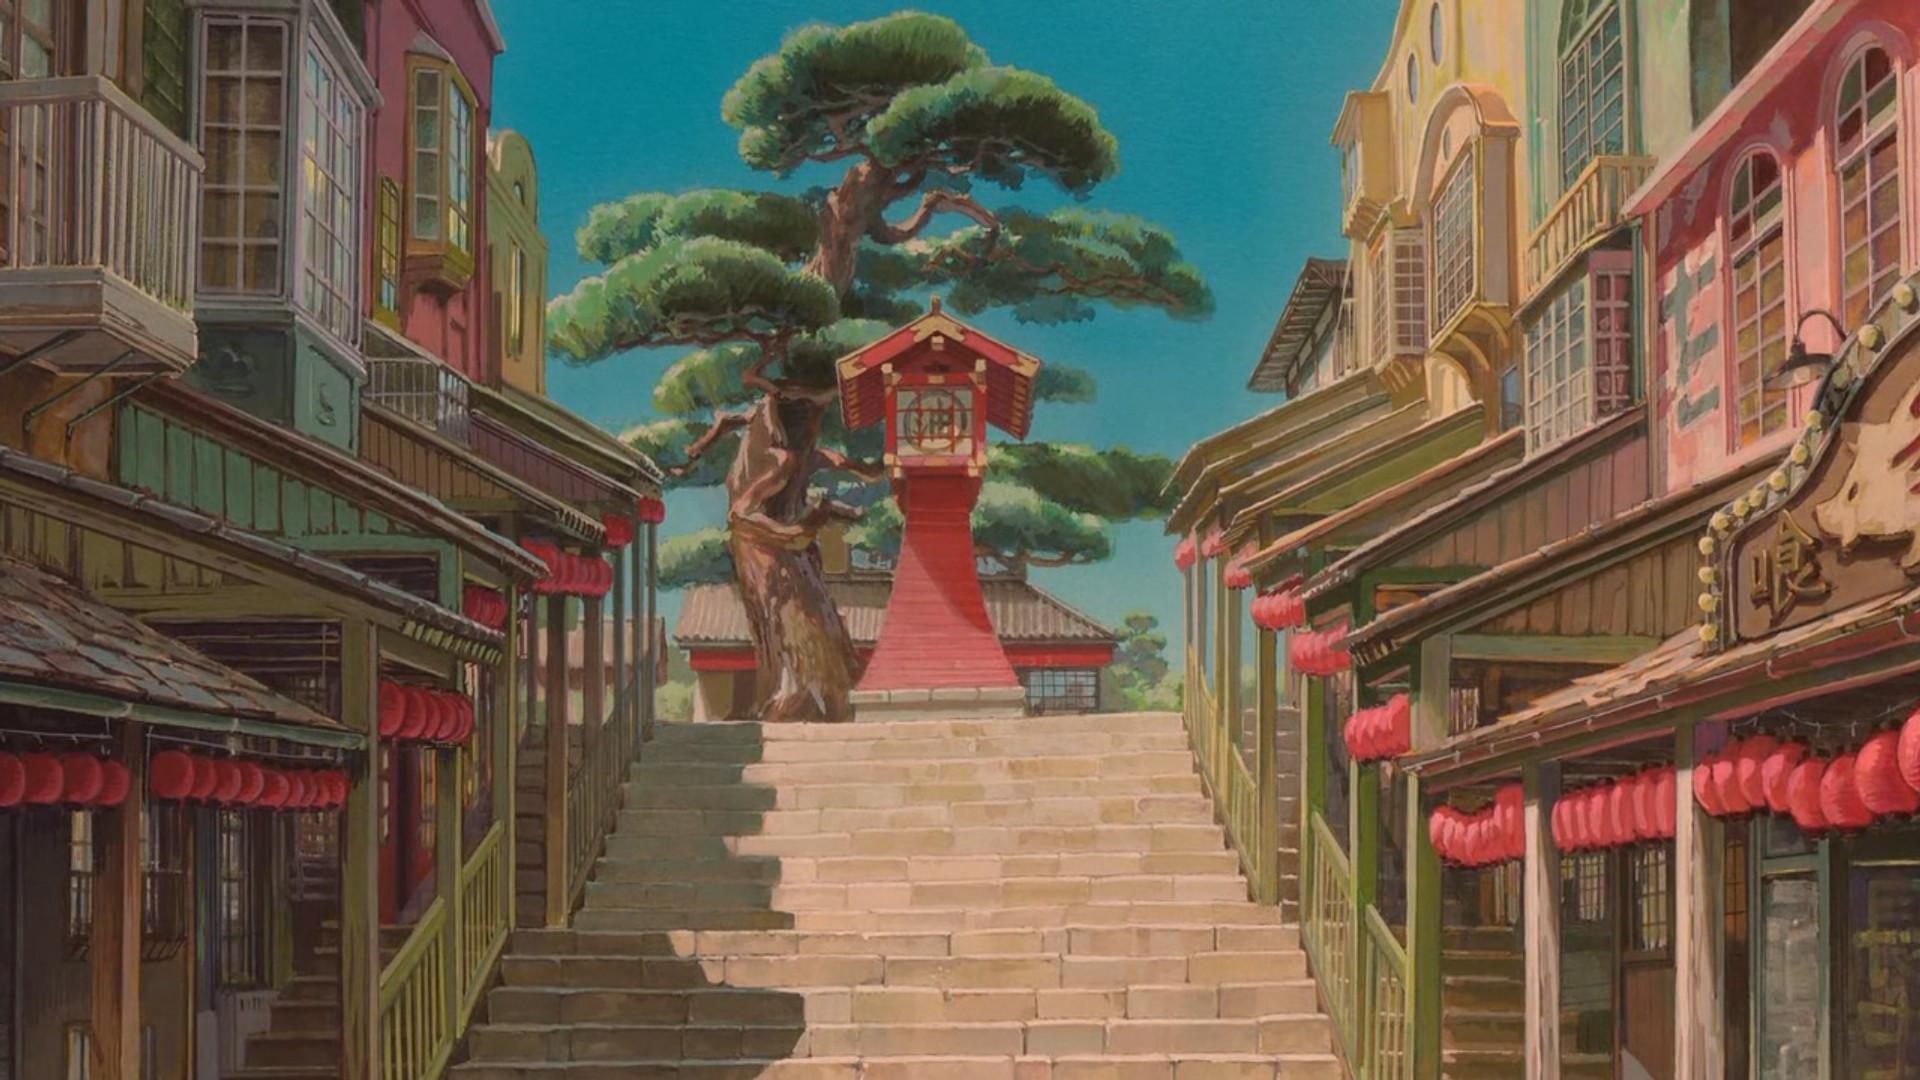 Studio Ghibli Desktop Wallpaper Hd Posted By John Simpson